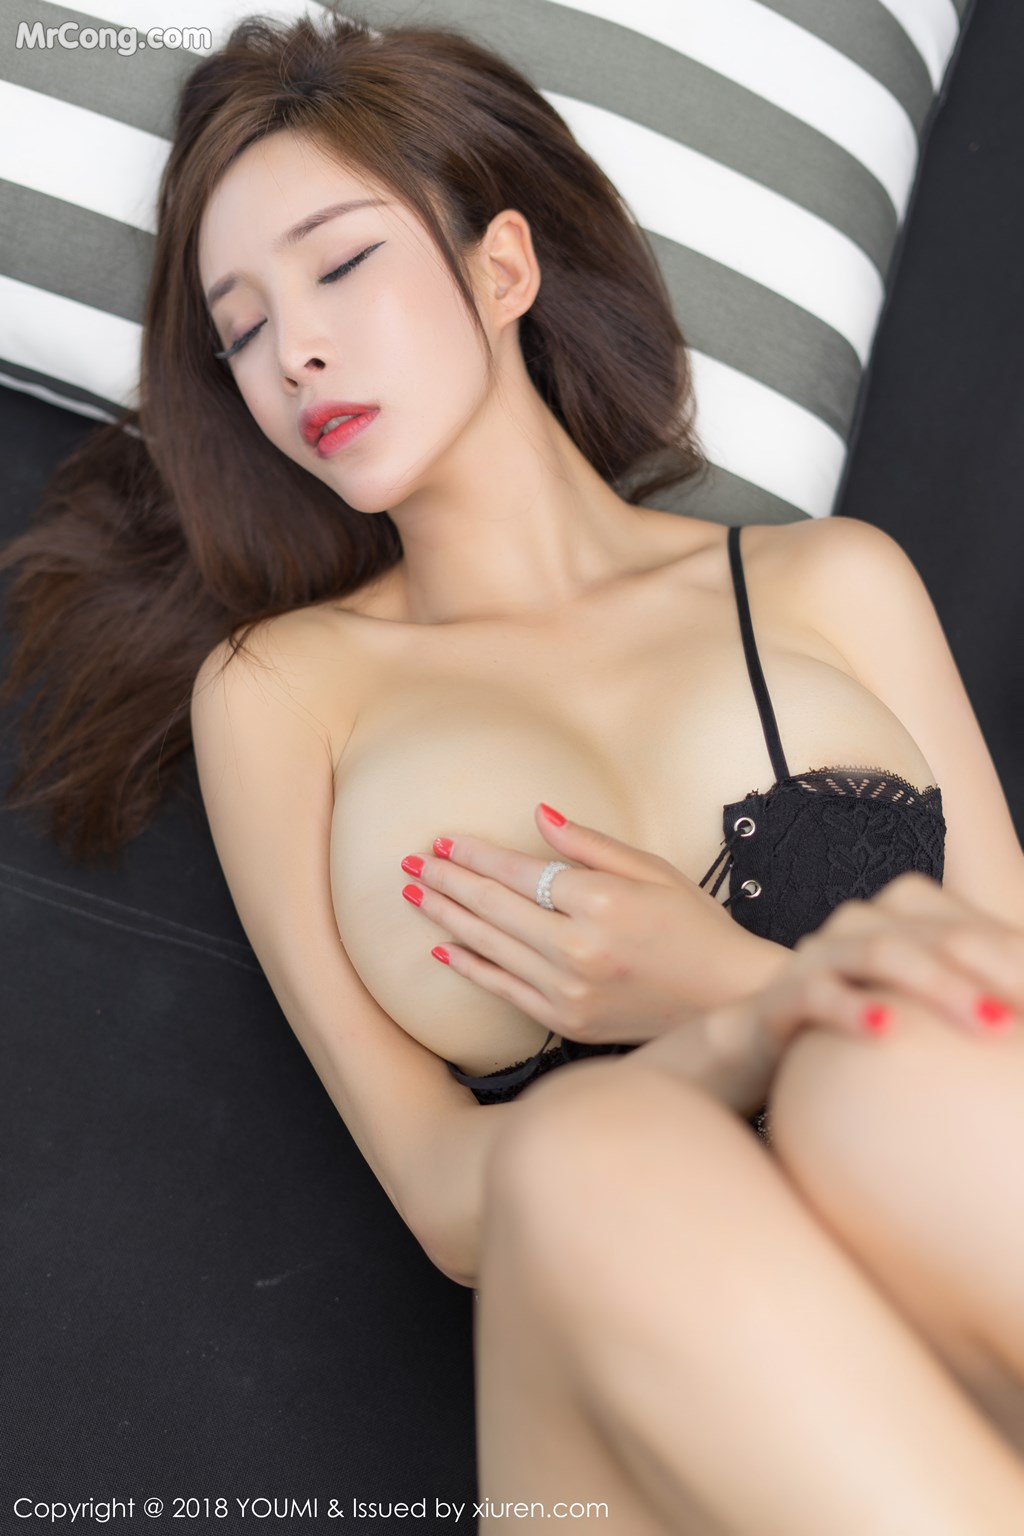 Image YouMi-Vol.213-Tu-Fei-Yuan-Ai-Cuo-Qiong-MrCong.com-003 in post YouMi Vol.213: Người mẫu 奶瓶土肥圆 (50 ảnh)